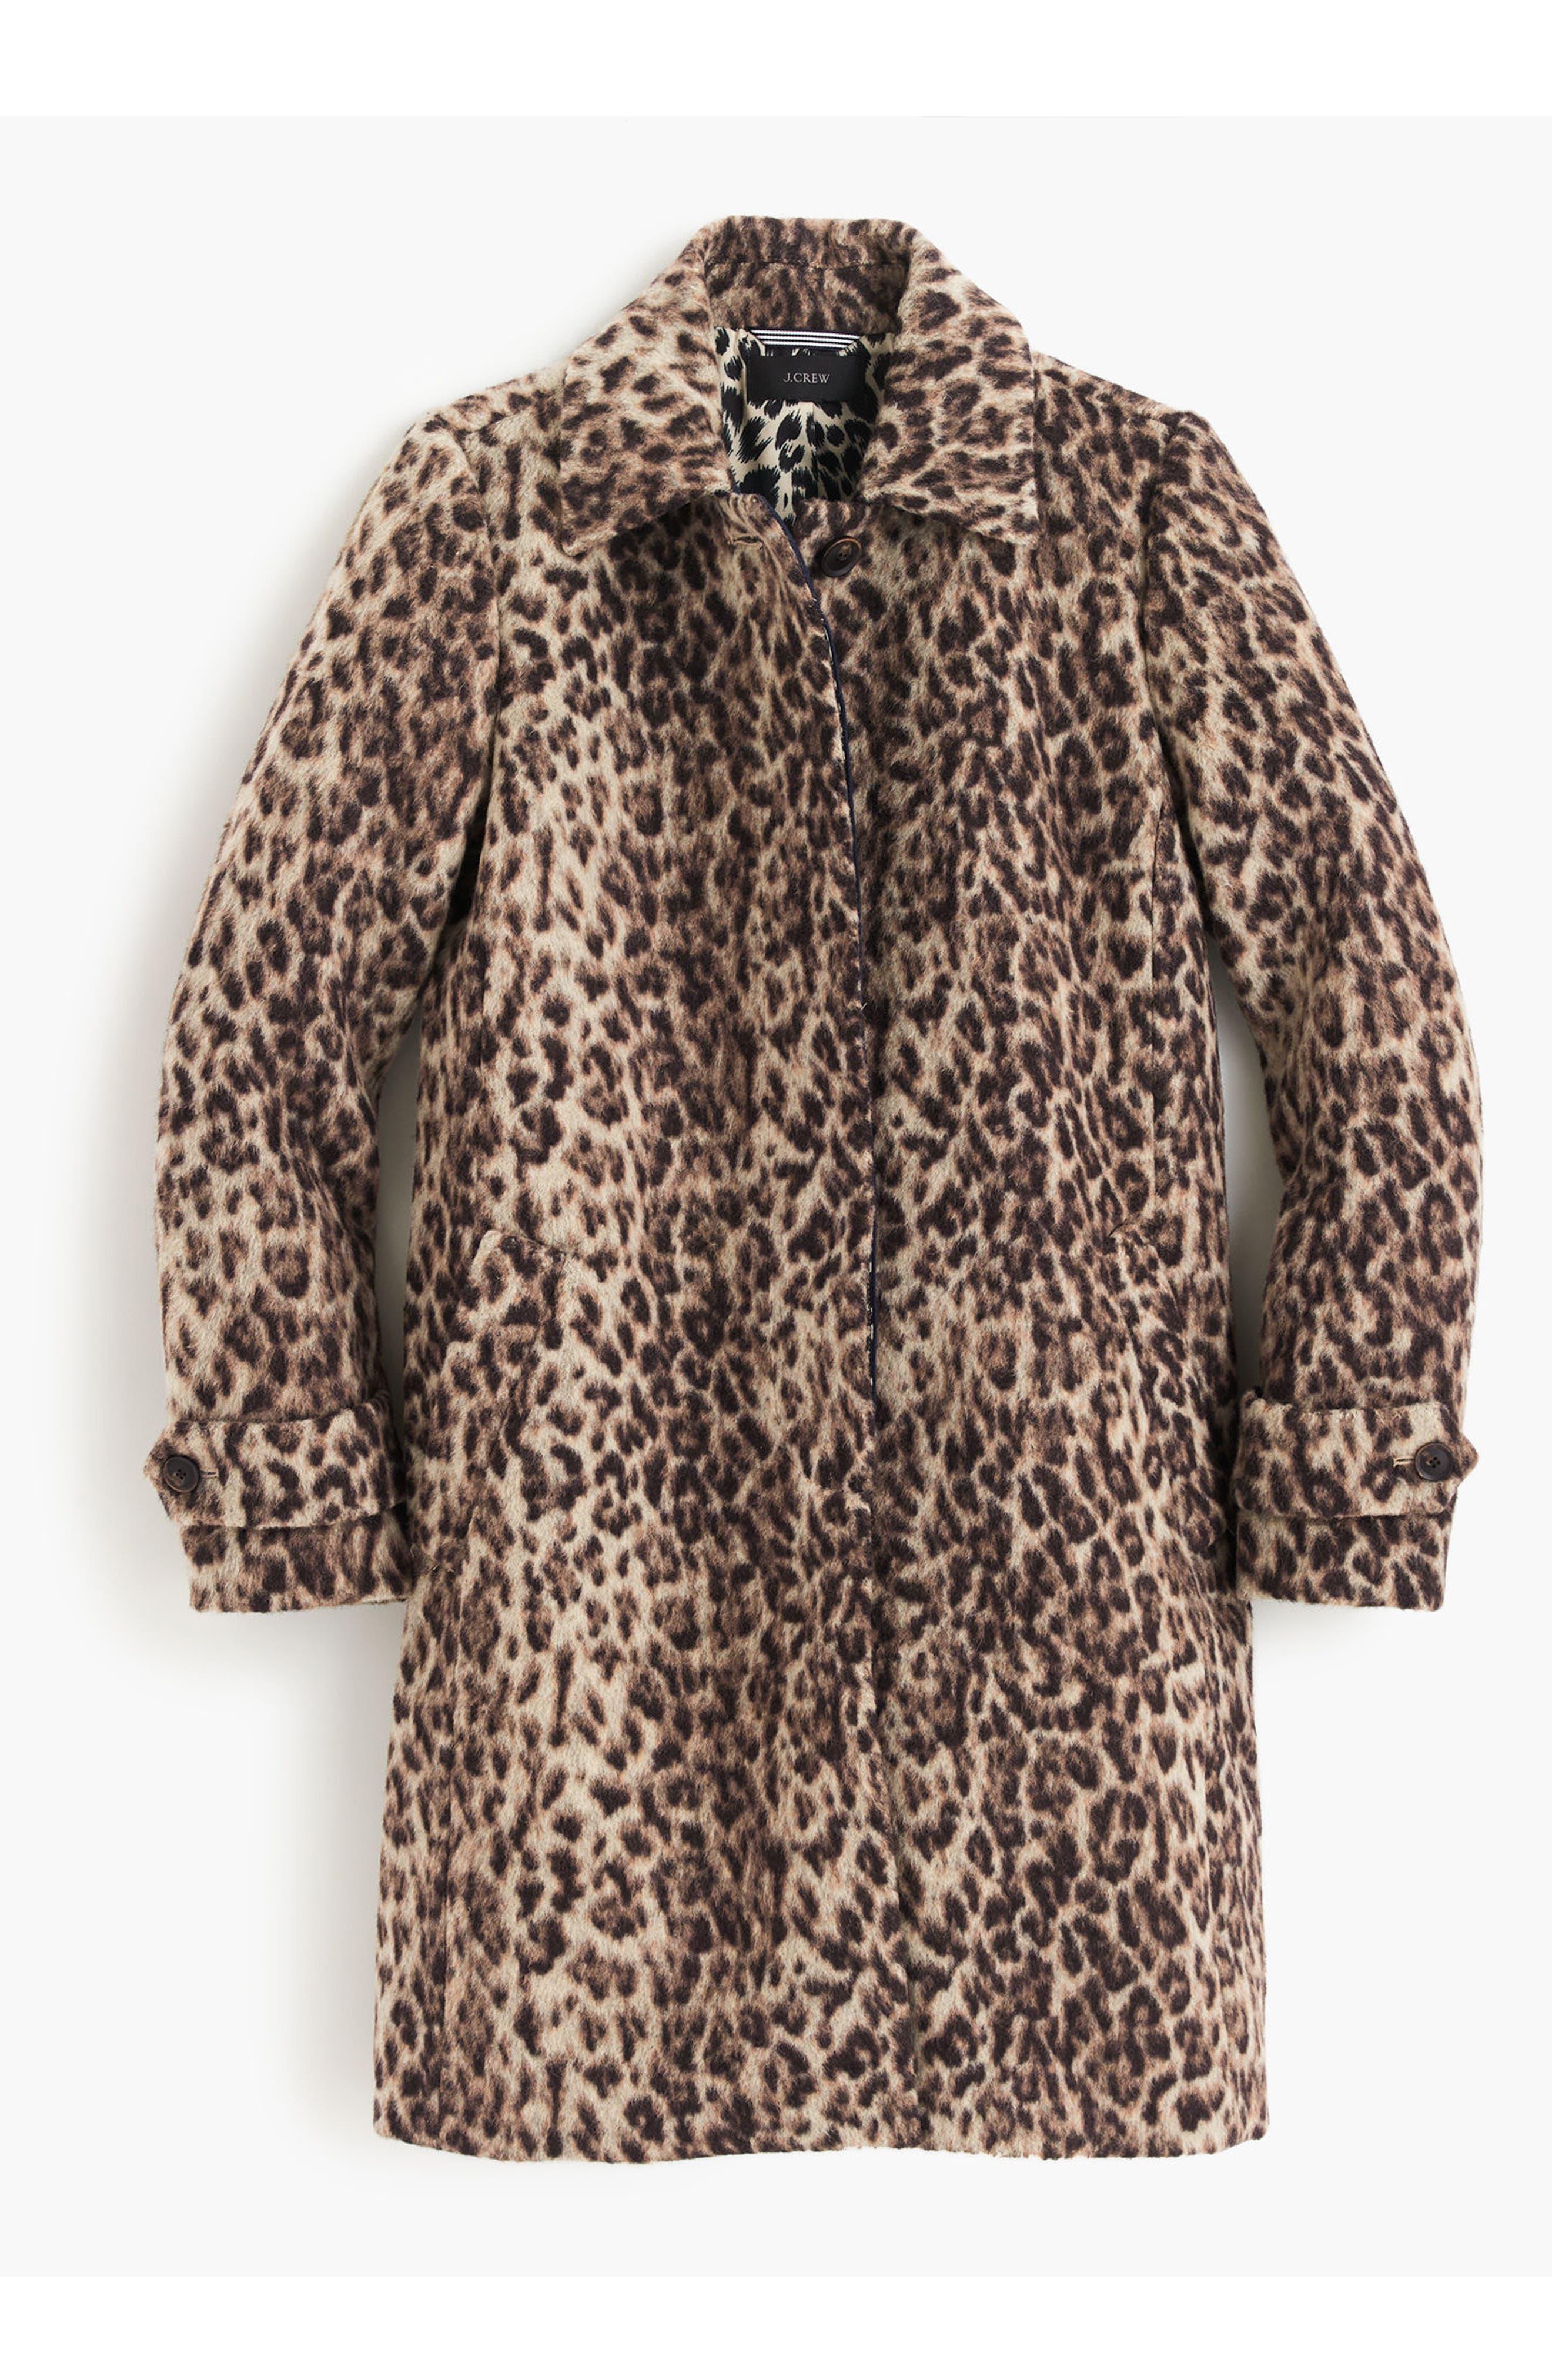 Double Leopard Topcoat,                             Alternate thumbnail 4, color,                             209